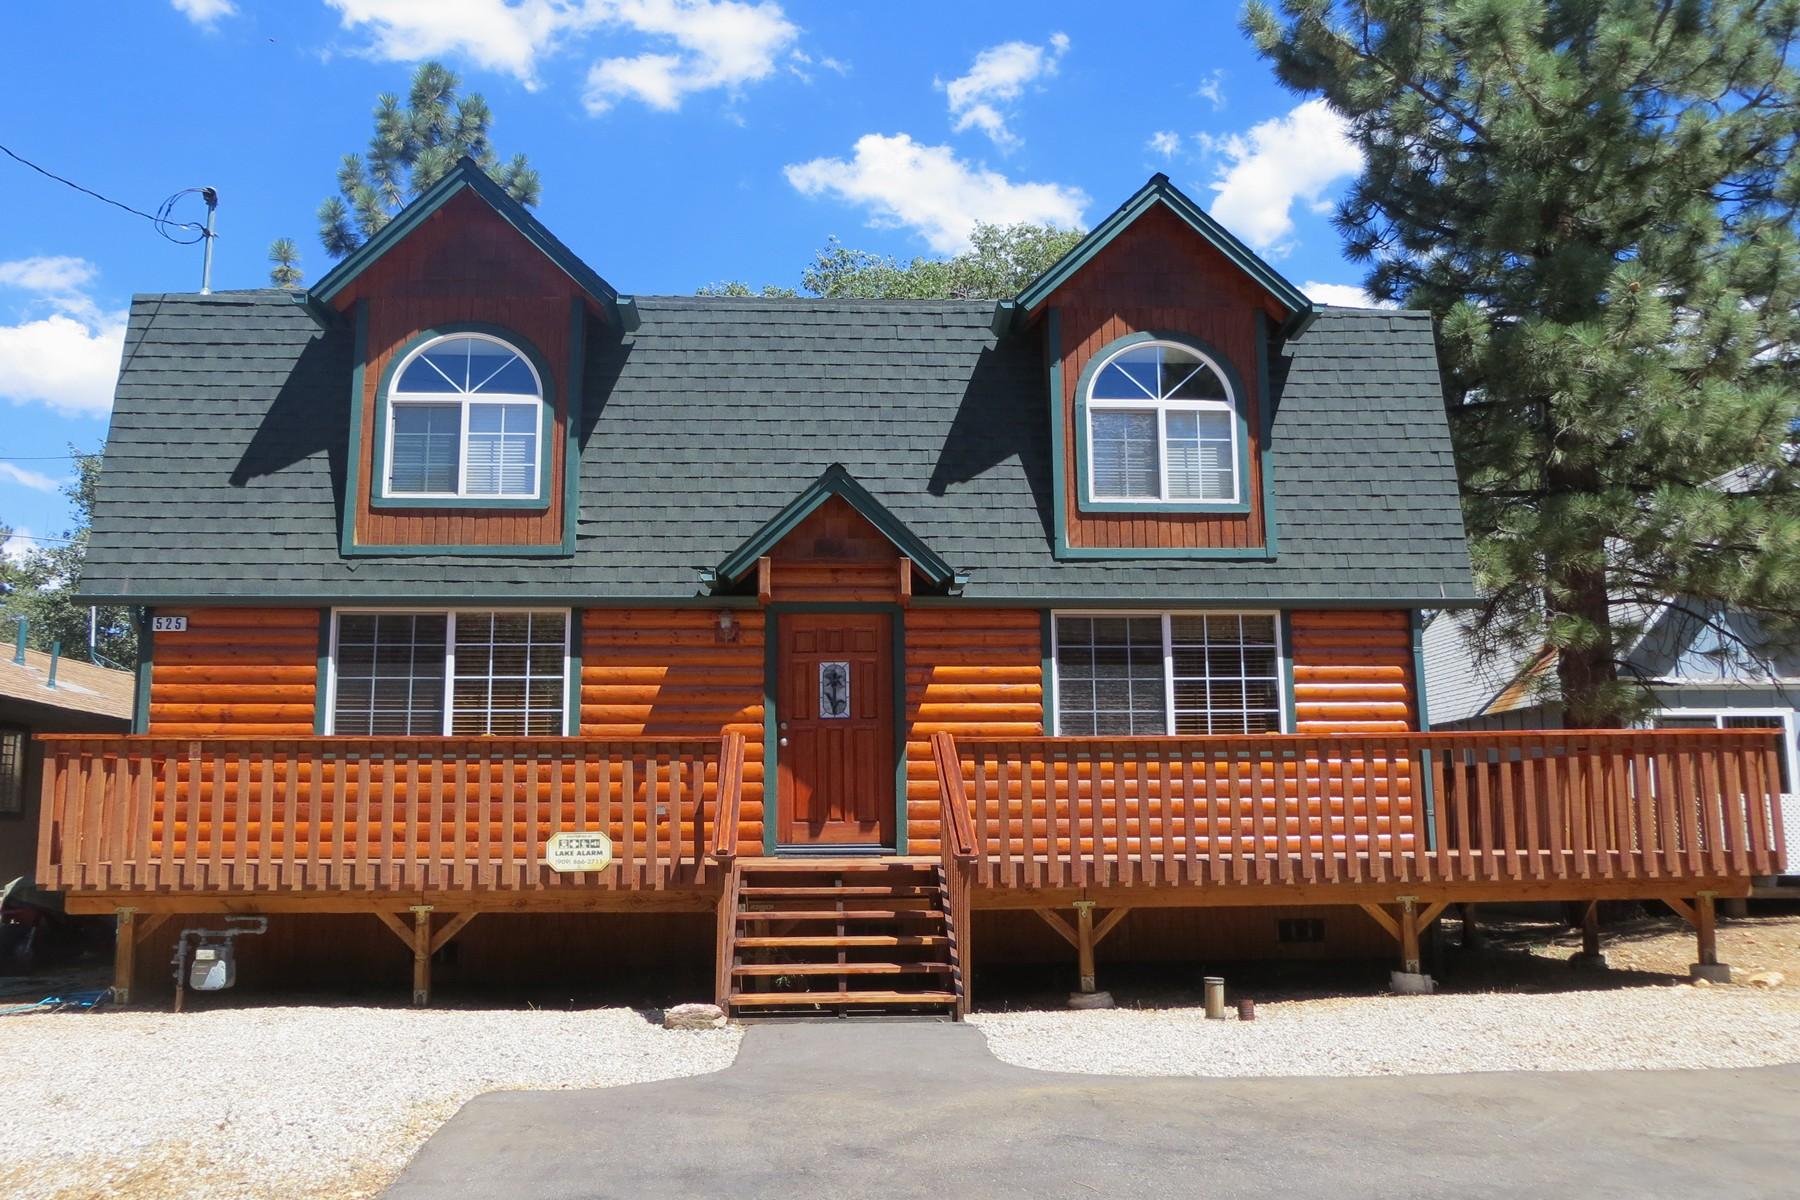 Nhà ở một gia đình vì Bán tại 525 Santa Barbara Ave. Sugarloaf, Ca. 92386 Sugarloaf, California, 92386 Hoa Kỳ